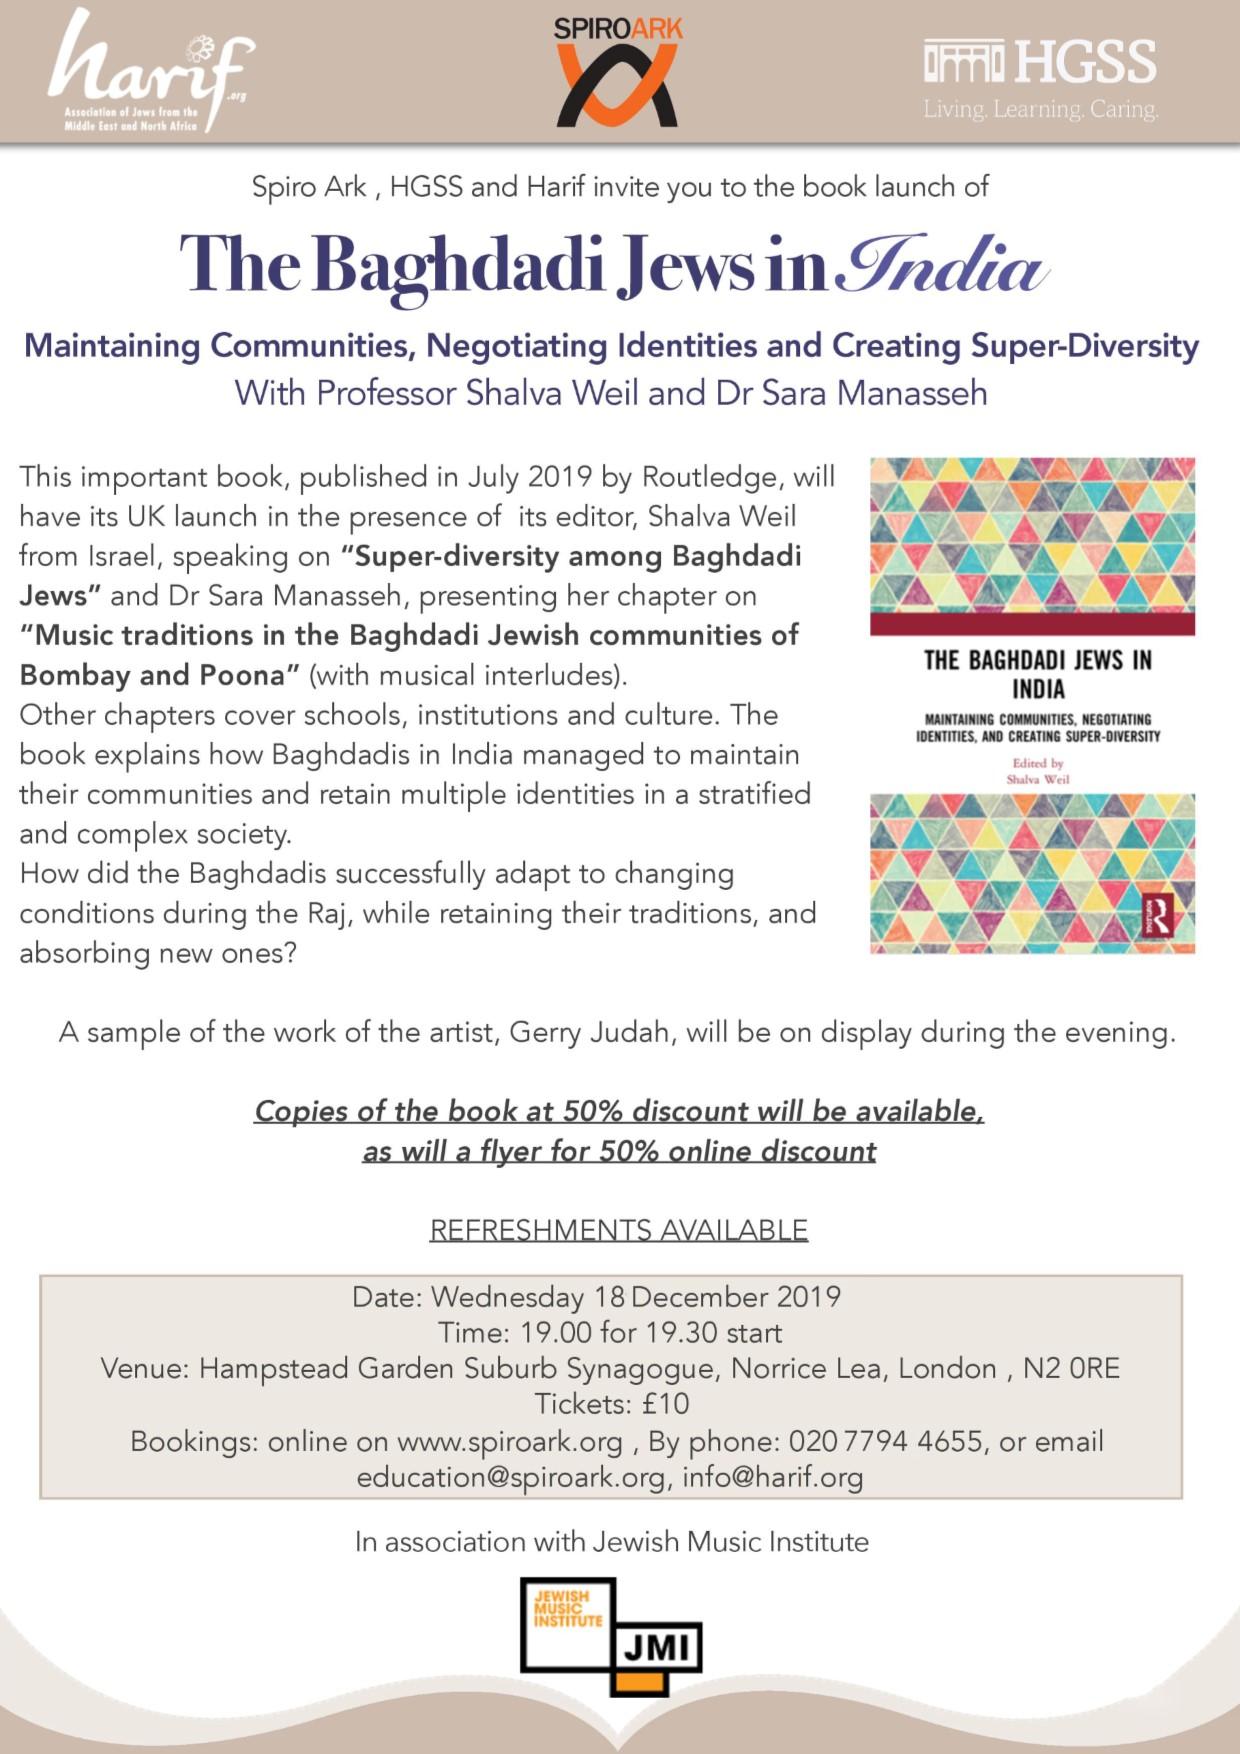 Spiro Ark - The Baghdadi Jews in India @ The Landy Gallery